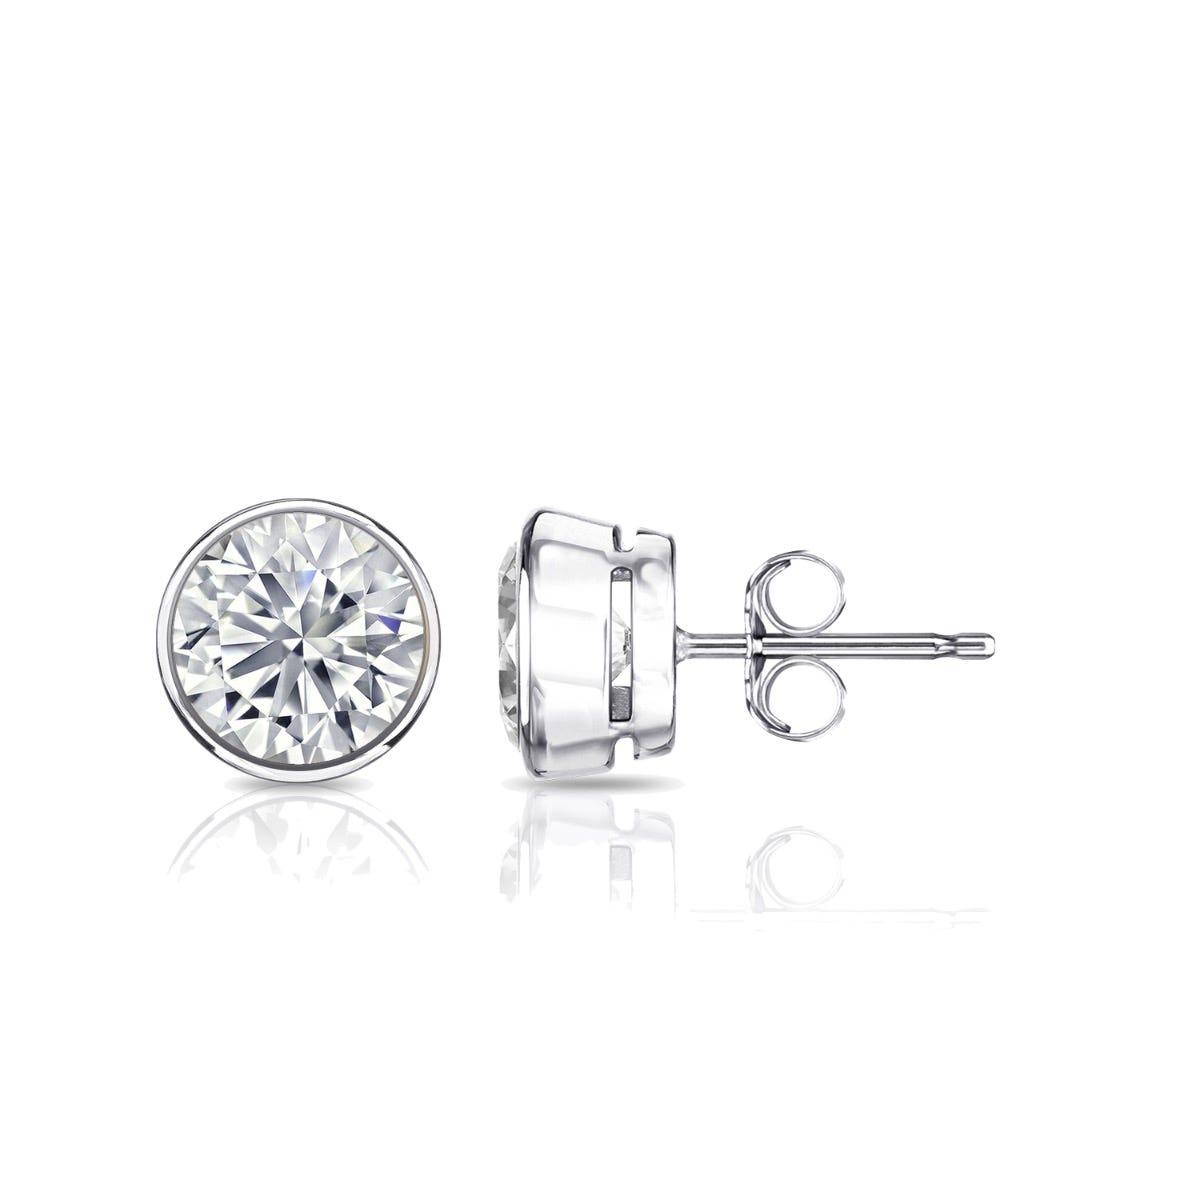 Diamond Round Bezel-Set 1ctw. Solitaire Stud (IJ-VS2) Earrings in Platinum